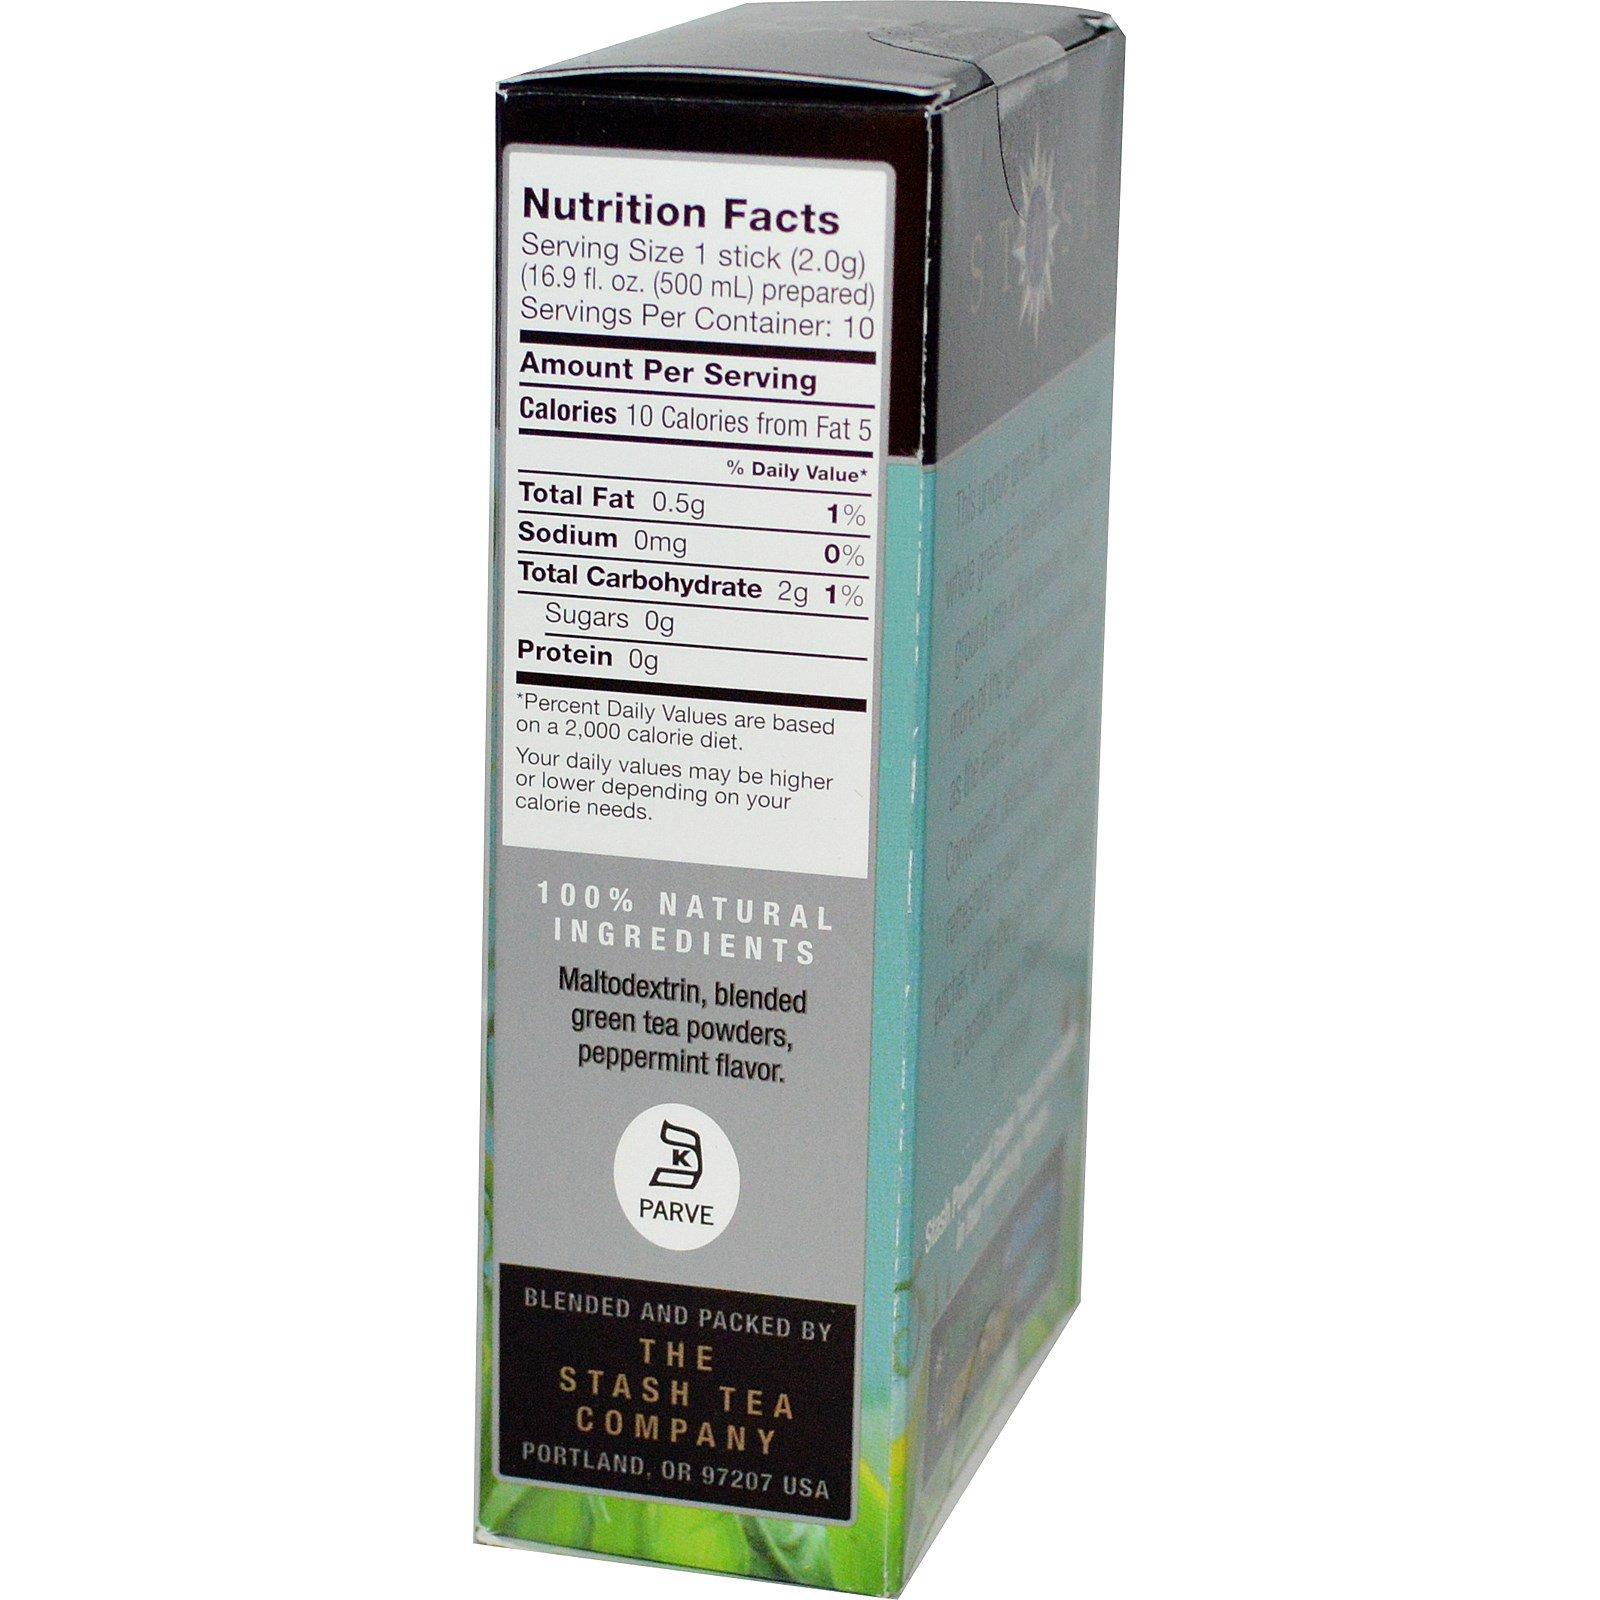 Stash Tea, Iced Green Tea Powder, Mint